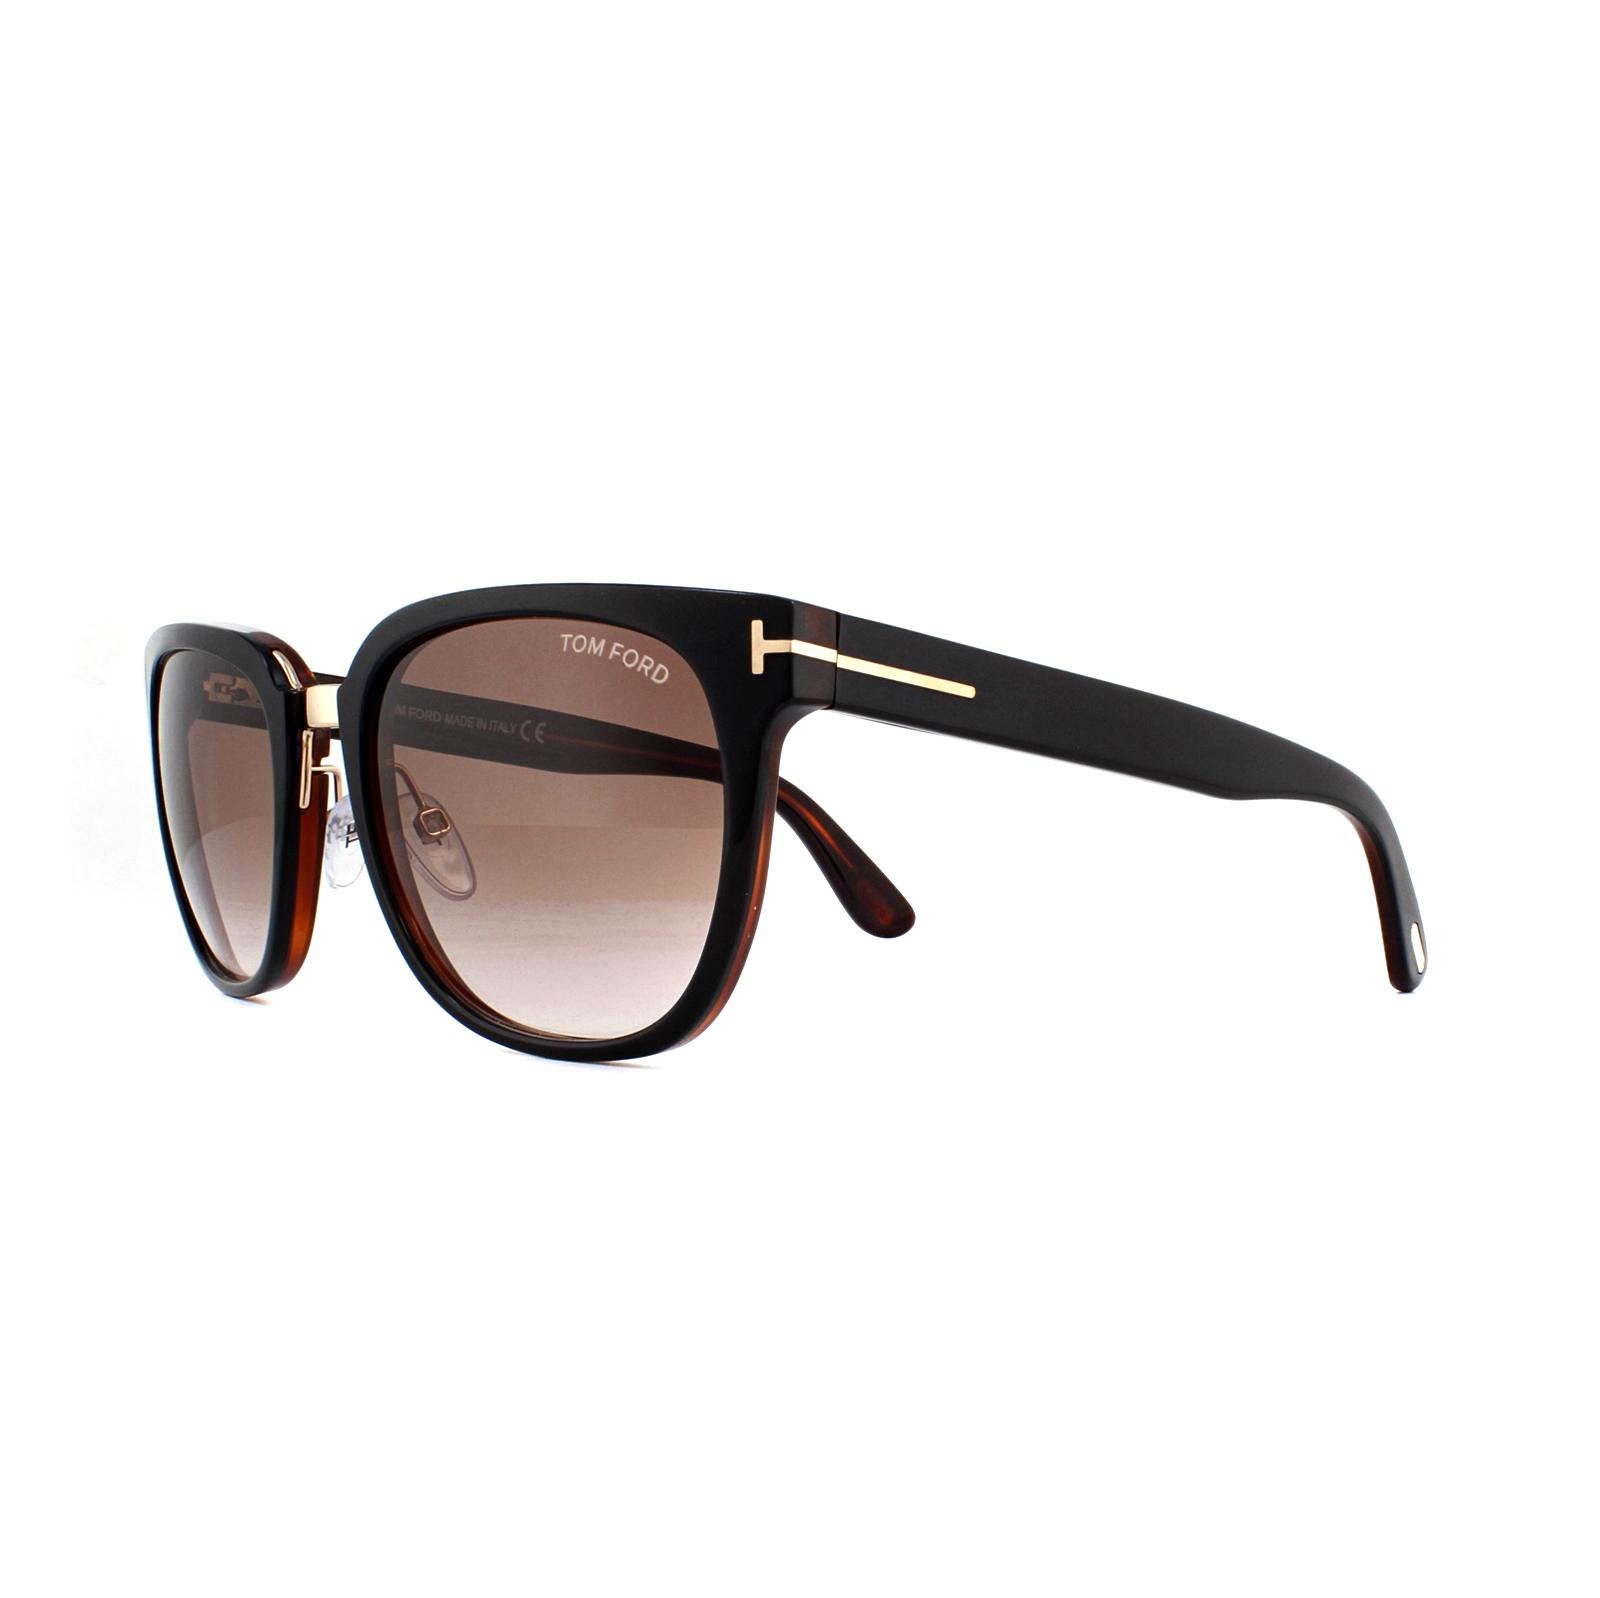 e803fada444 Sentinel Tom Ford Sunglasses 0290 Rock 01F Shiny Black Brown Gradient.  Sentinel Thumbnail 2